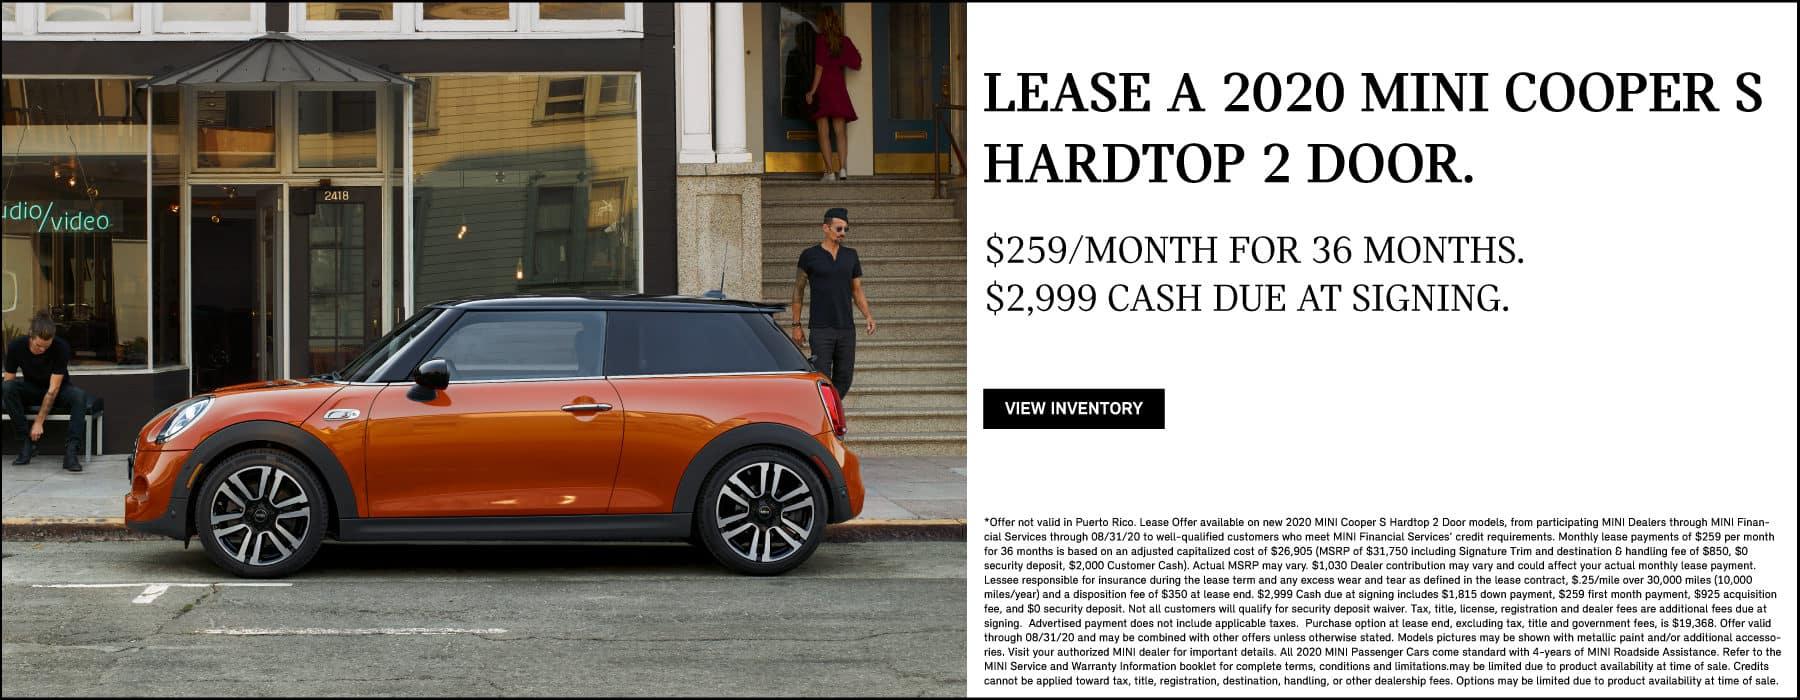 Lease a 2020 MINI Cooper S Hardtop 2 Door for $259/mo